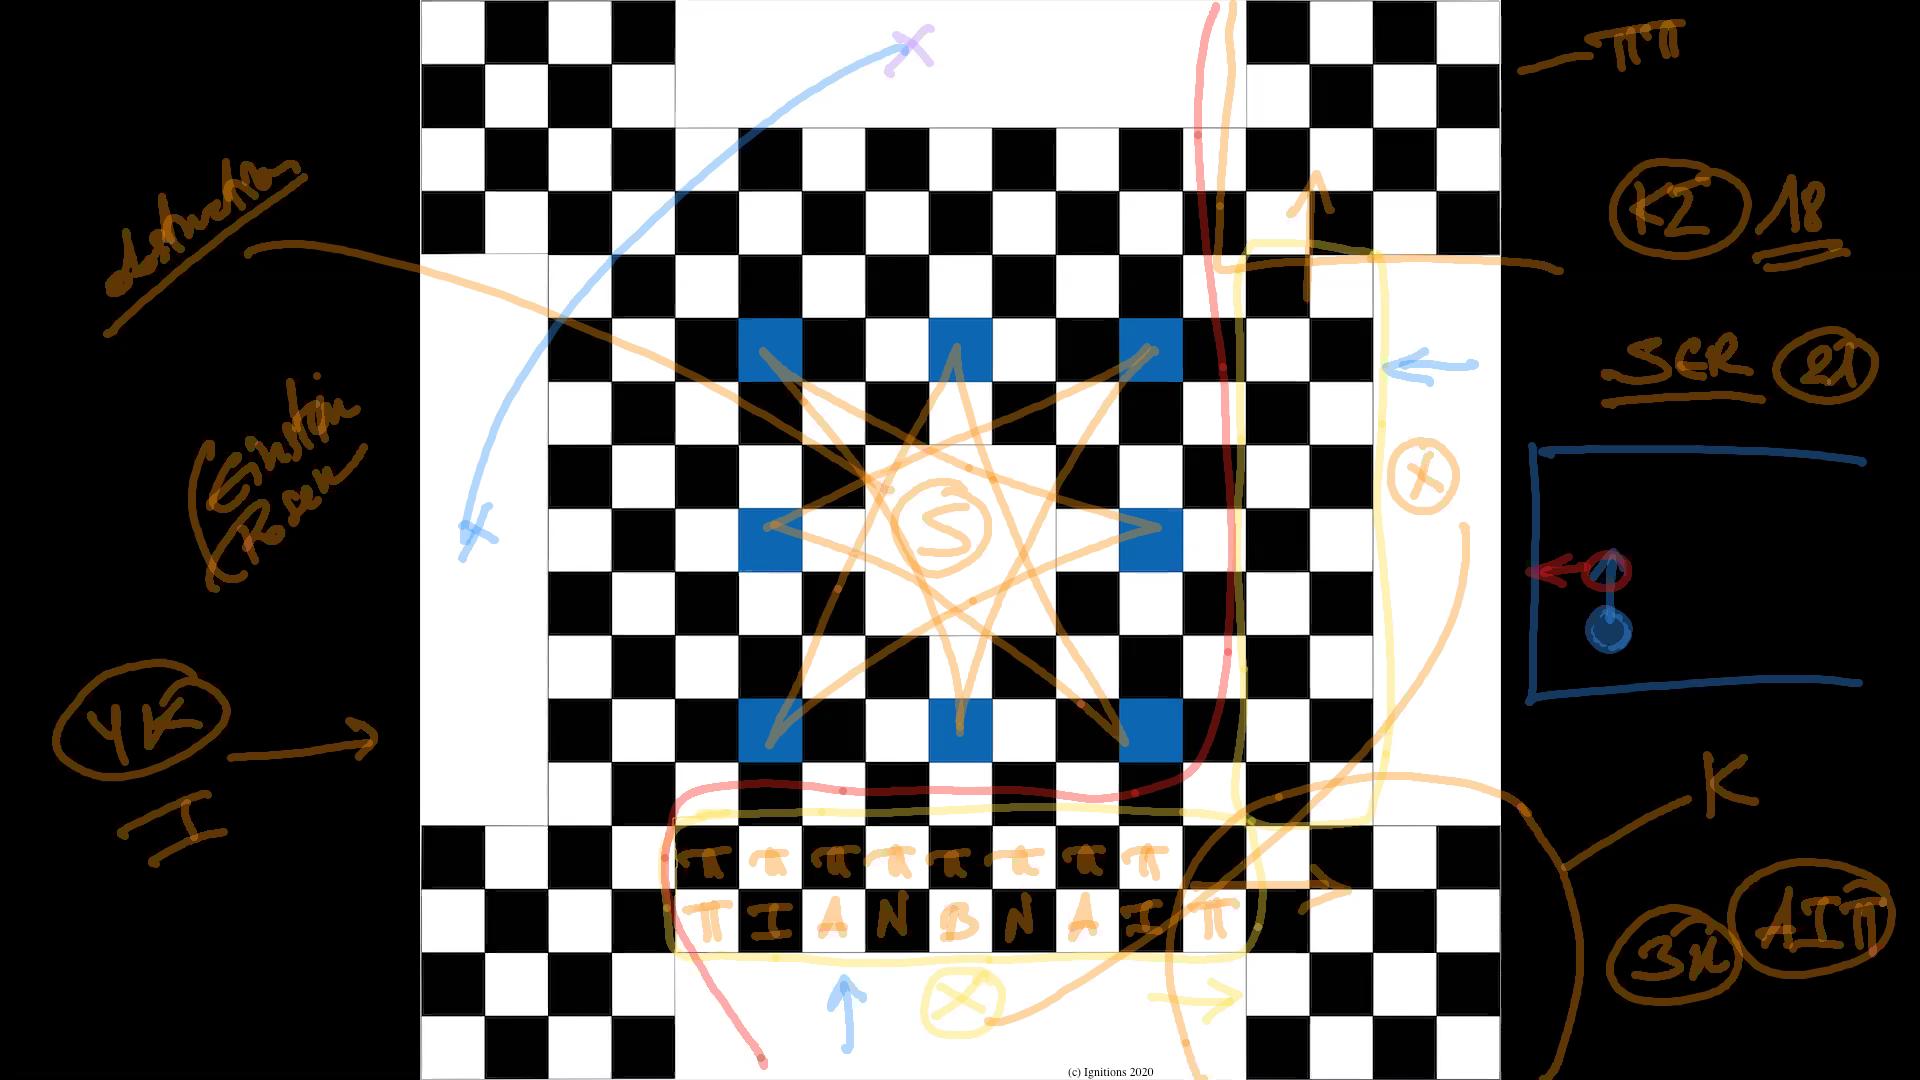 57203 - XI - Παιχνίδια Ανθρωπότητας. Έργο VIII. (Dessin)